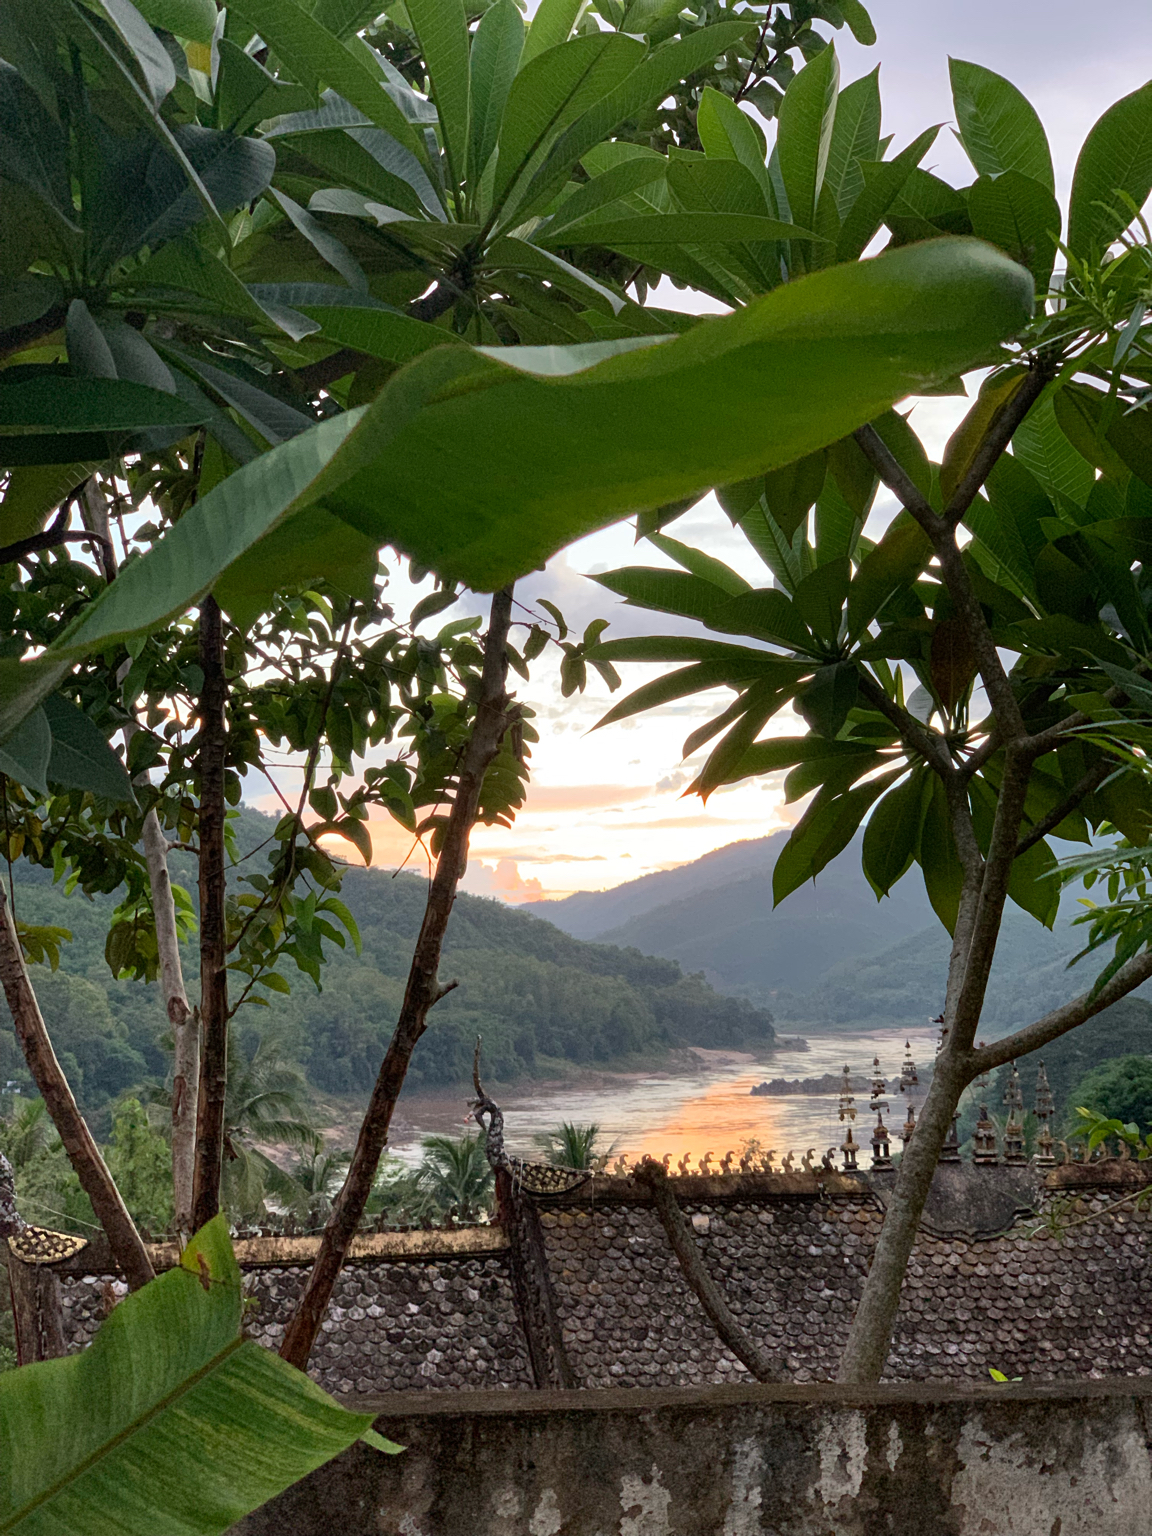 Photo of Laos By Victoria Rentrop